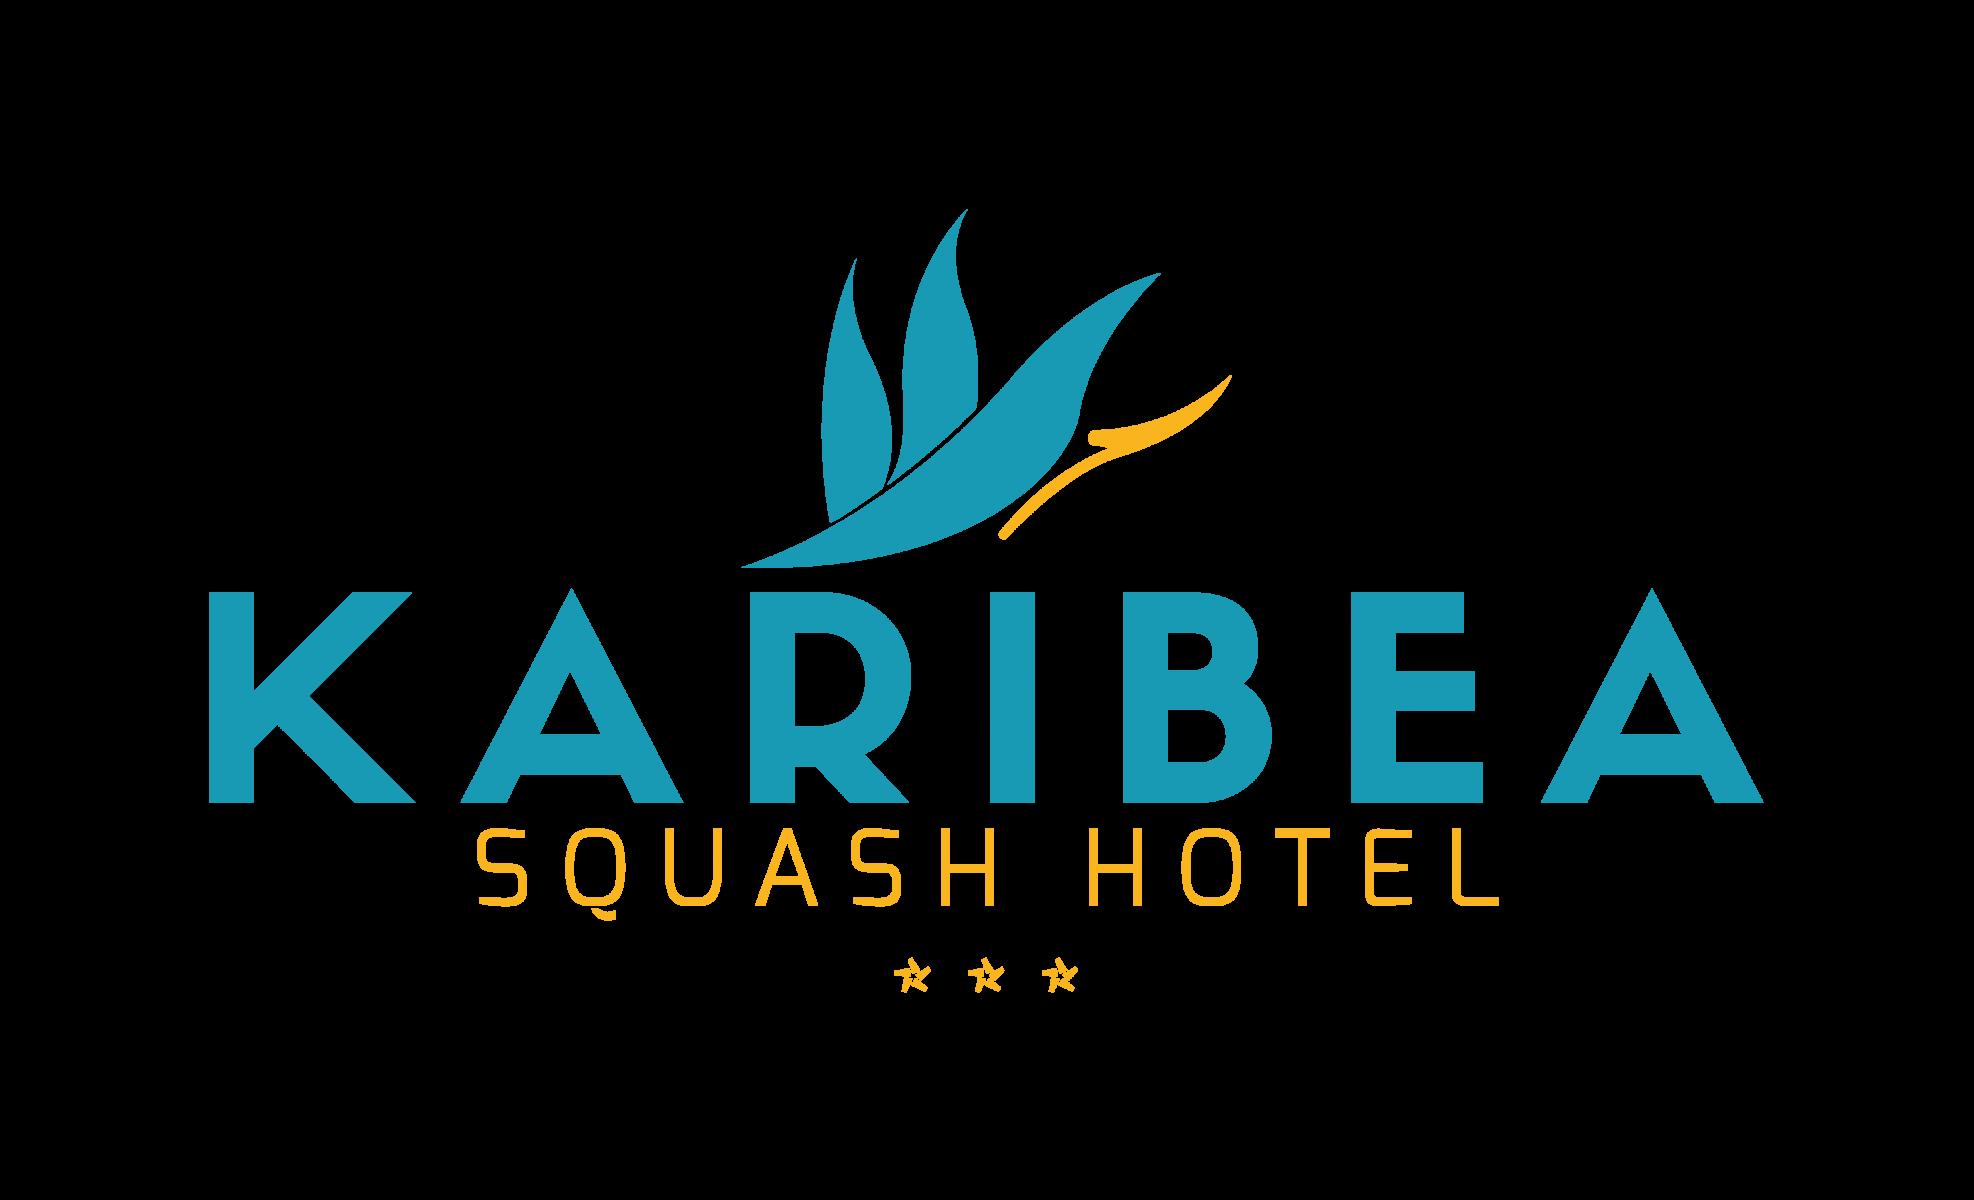 Logo Karibea Squash Hotel